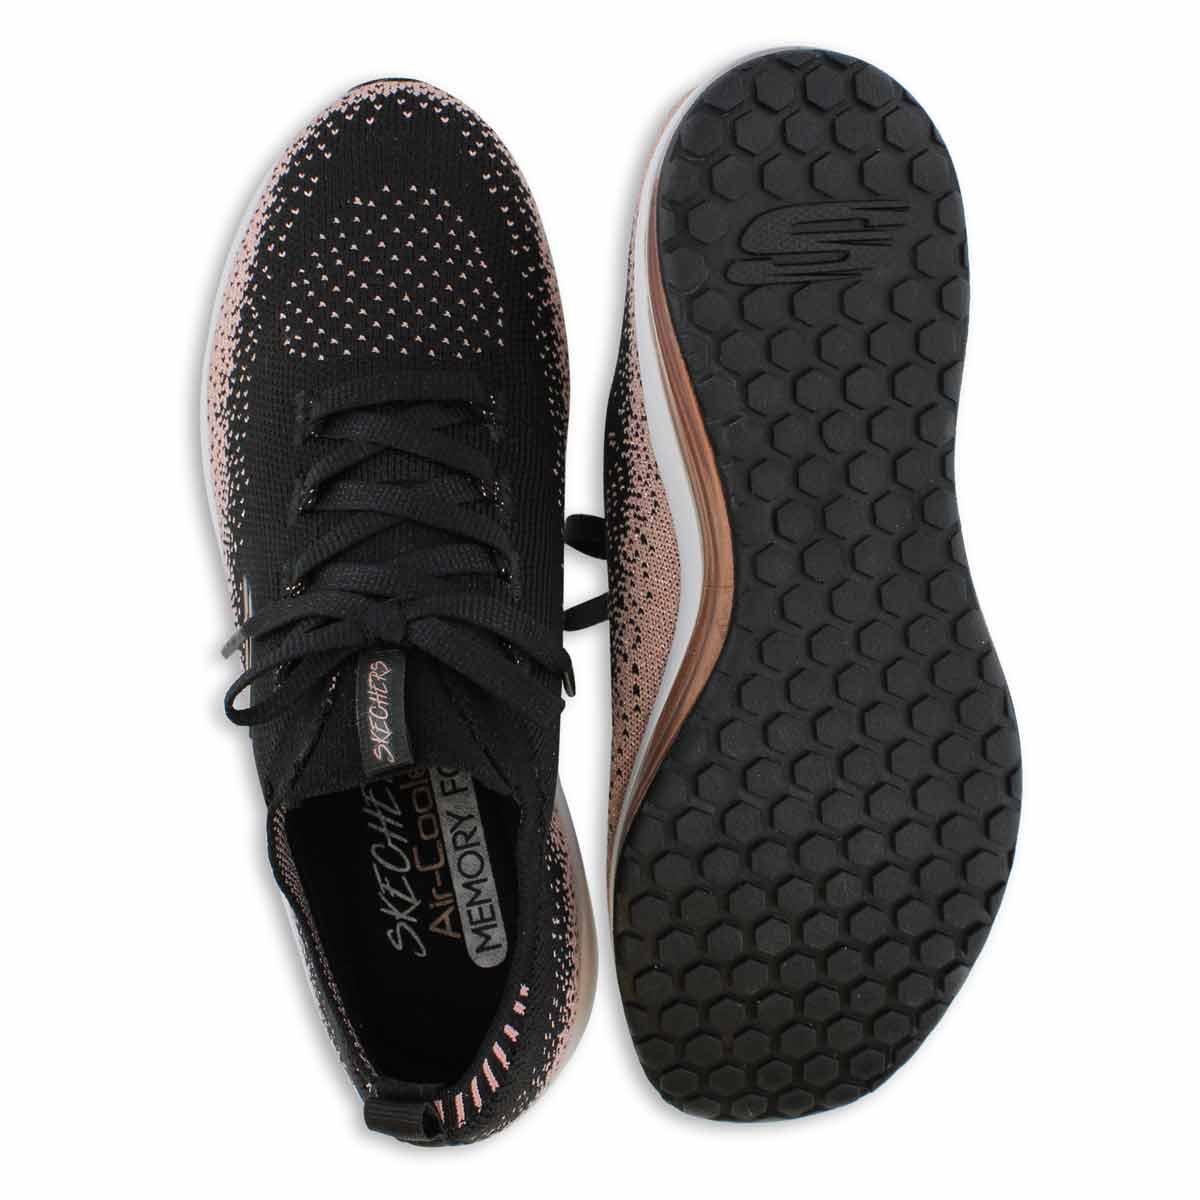 Lds Skech-Air Element blk/rsgld sneaker